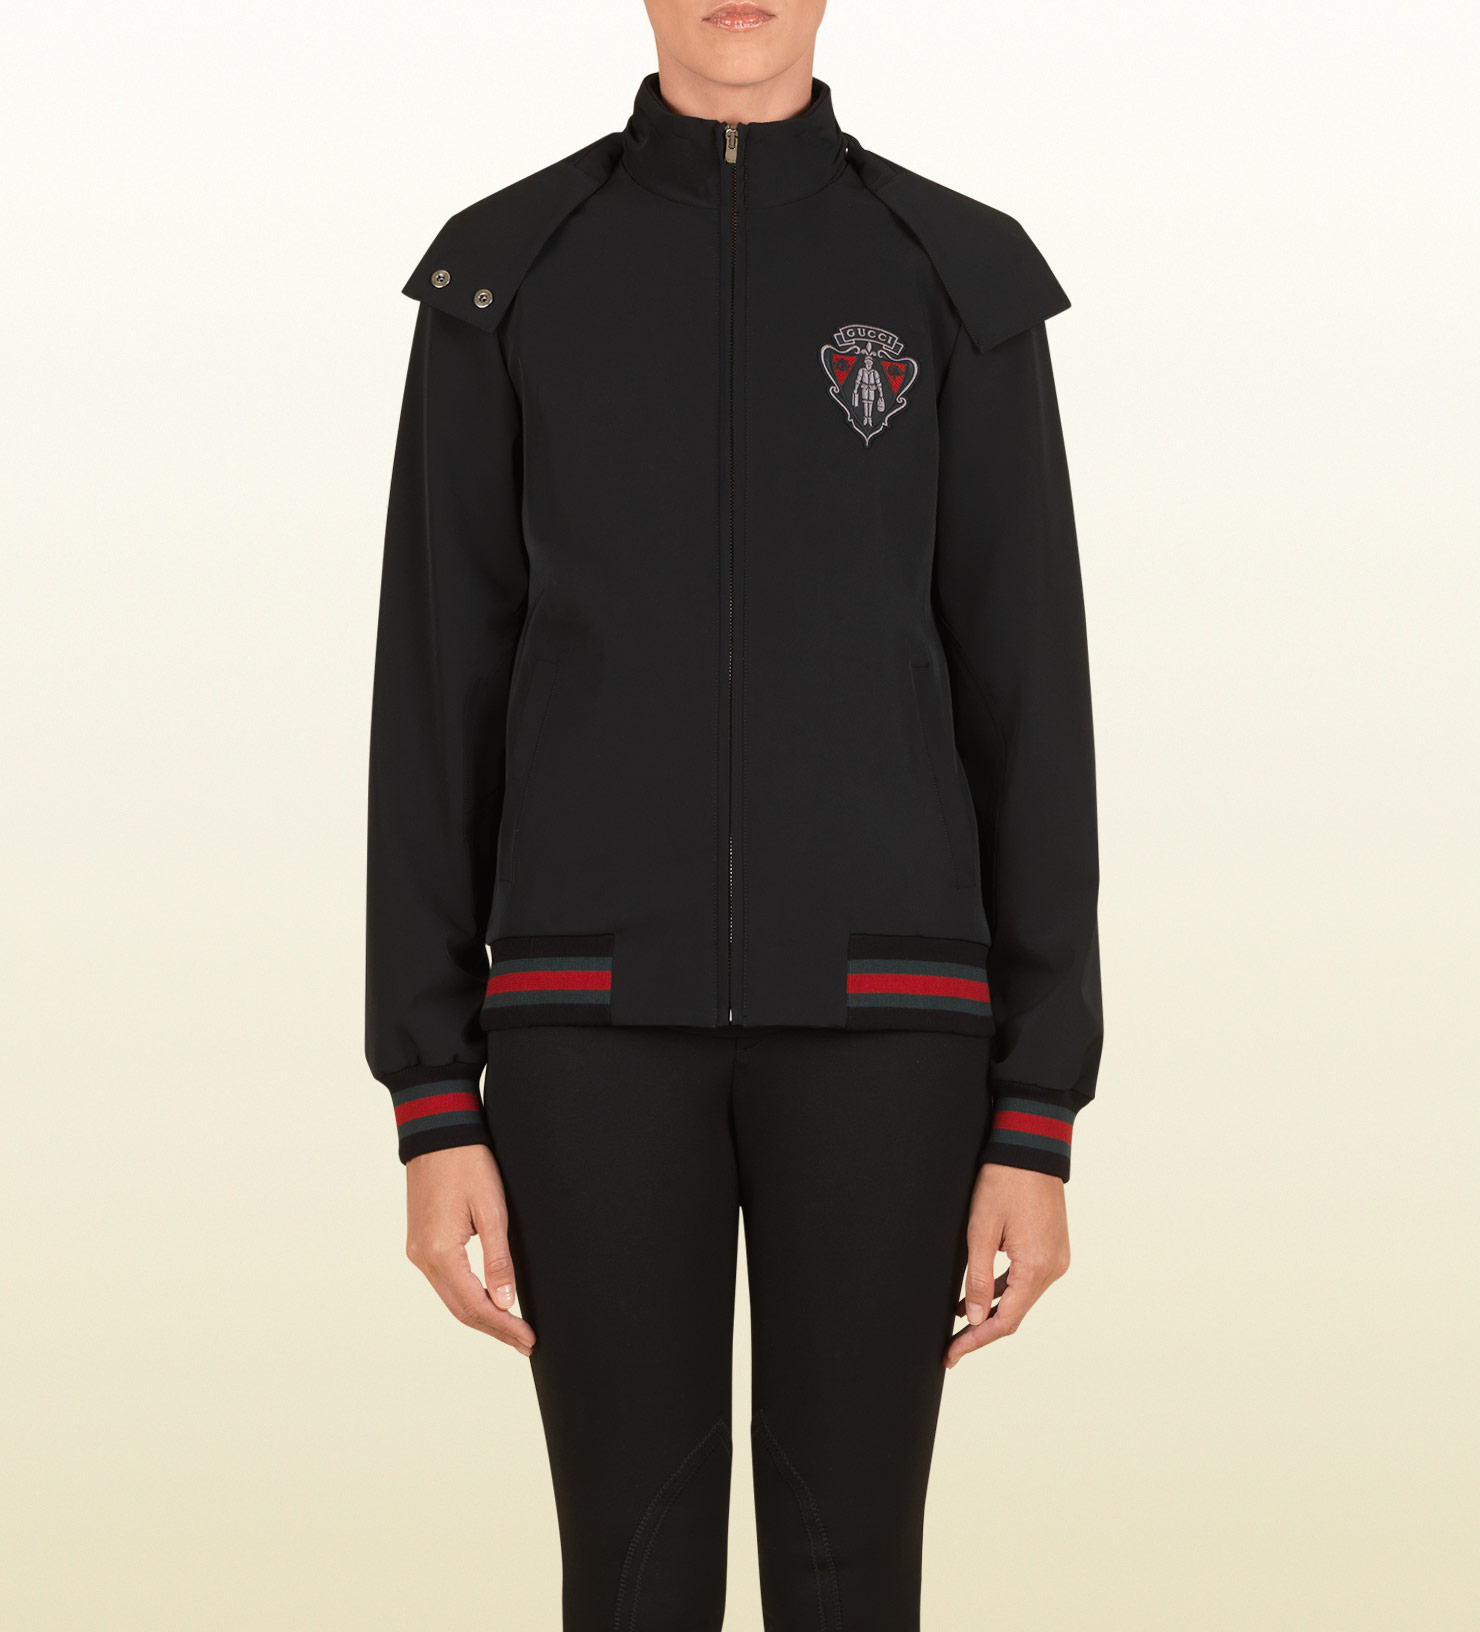 gucci zip up jacket. gallery gucci zip up jacket o